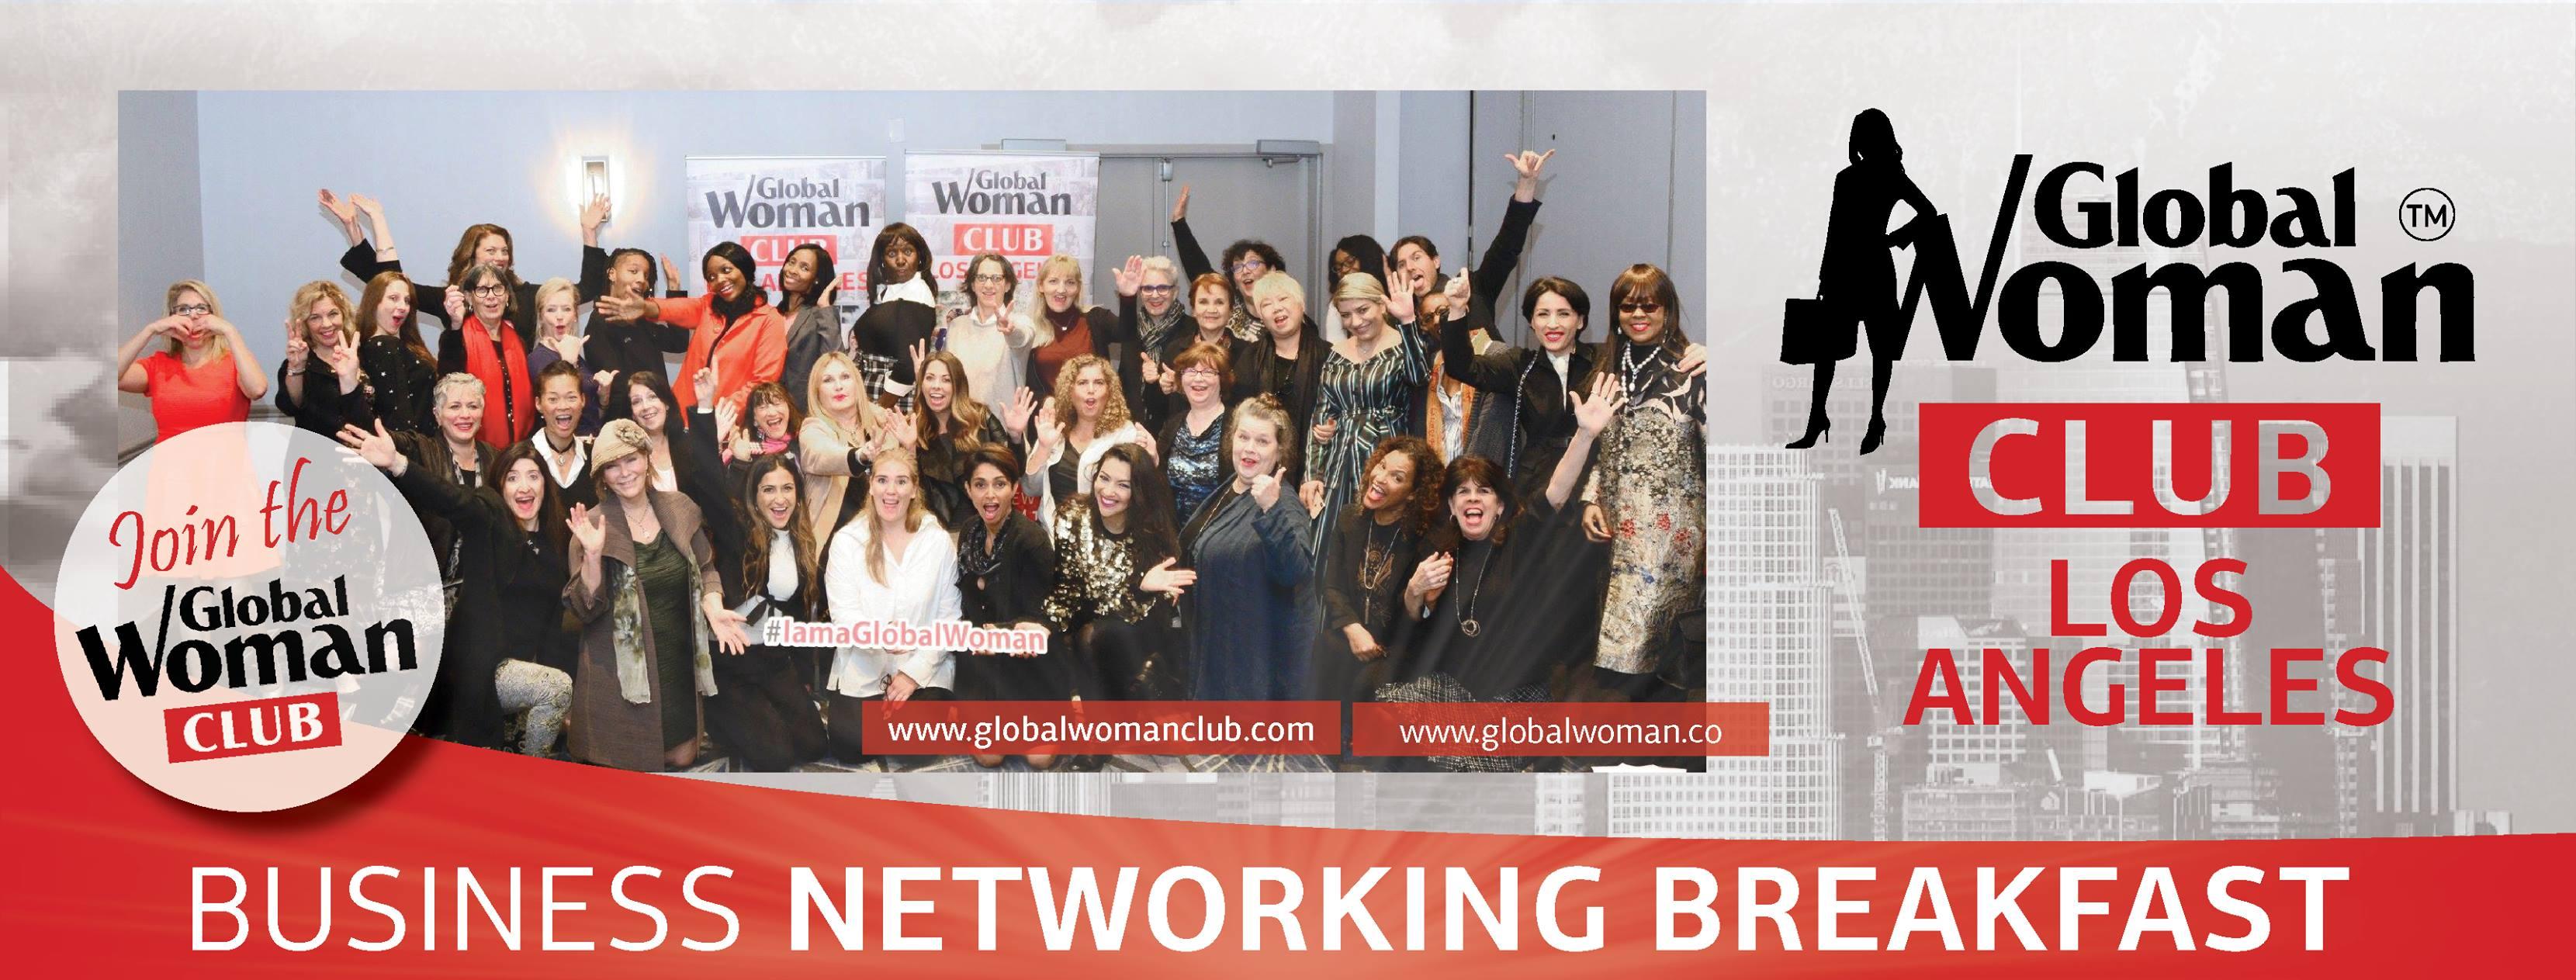 GLOBAL WOMAN CLUB Los Angeles : BUSINESS NETWORKING MEETING